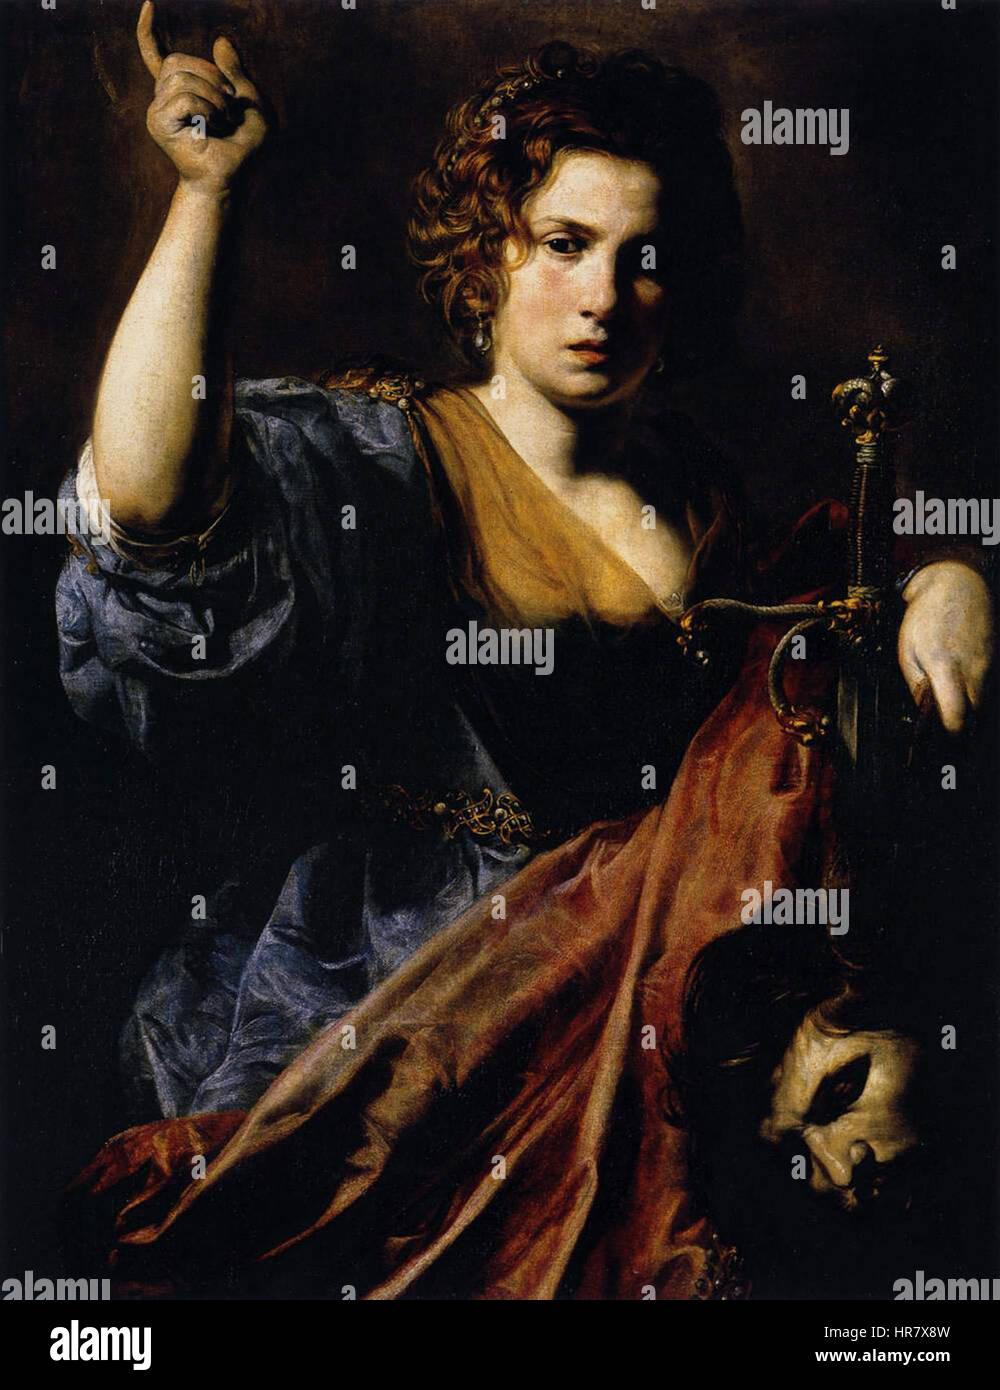 Valentin de Boulogne - Judith - WGA24243 - Stock Image